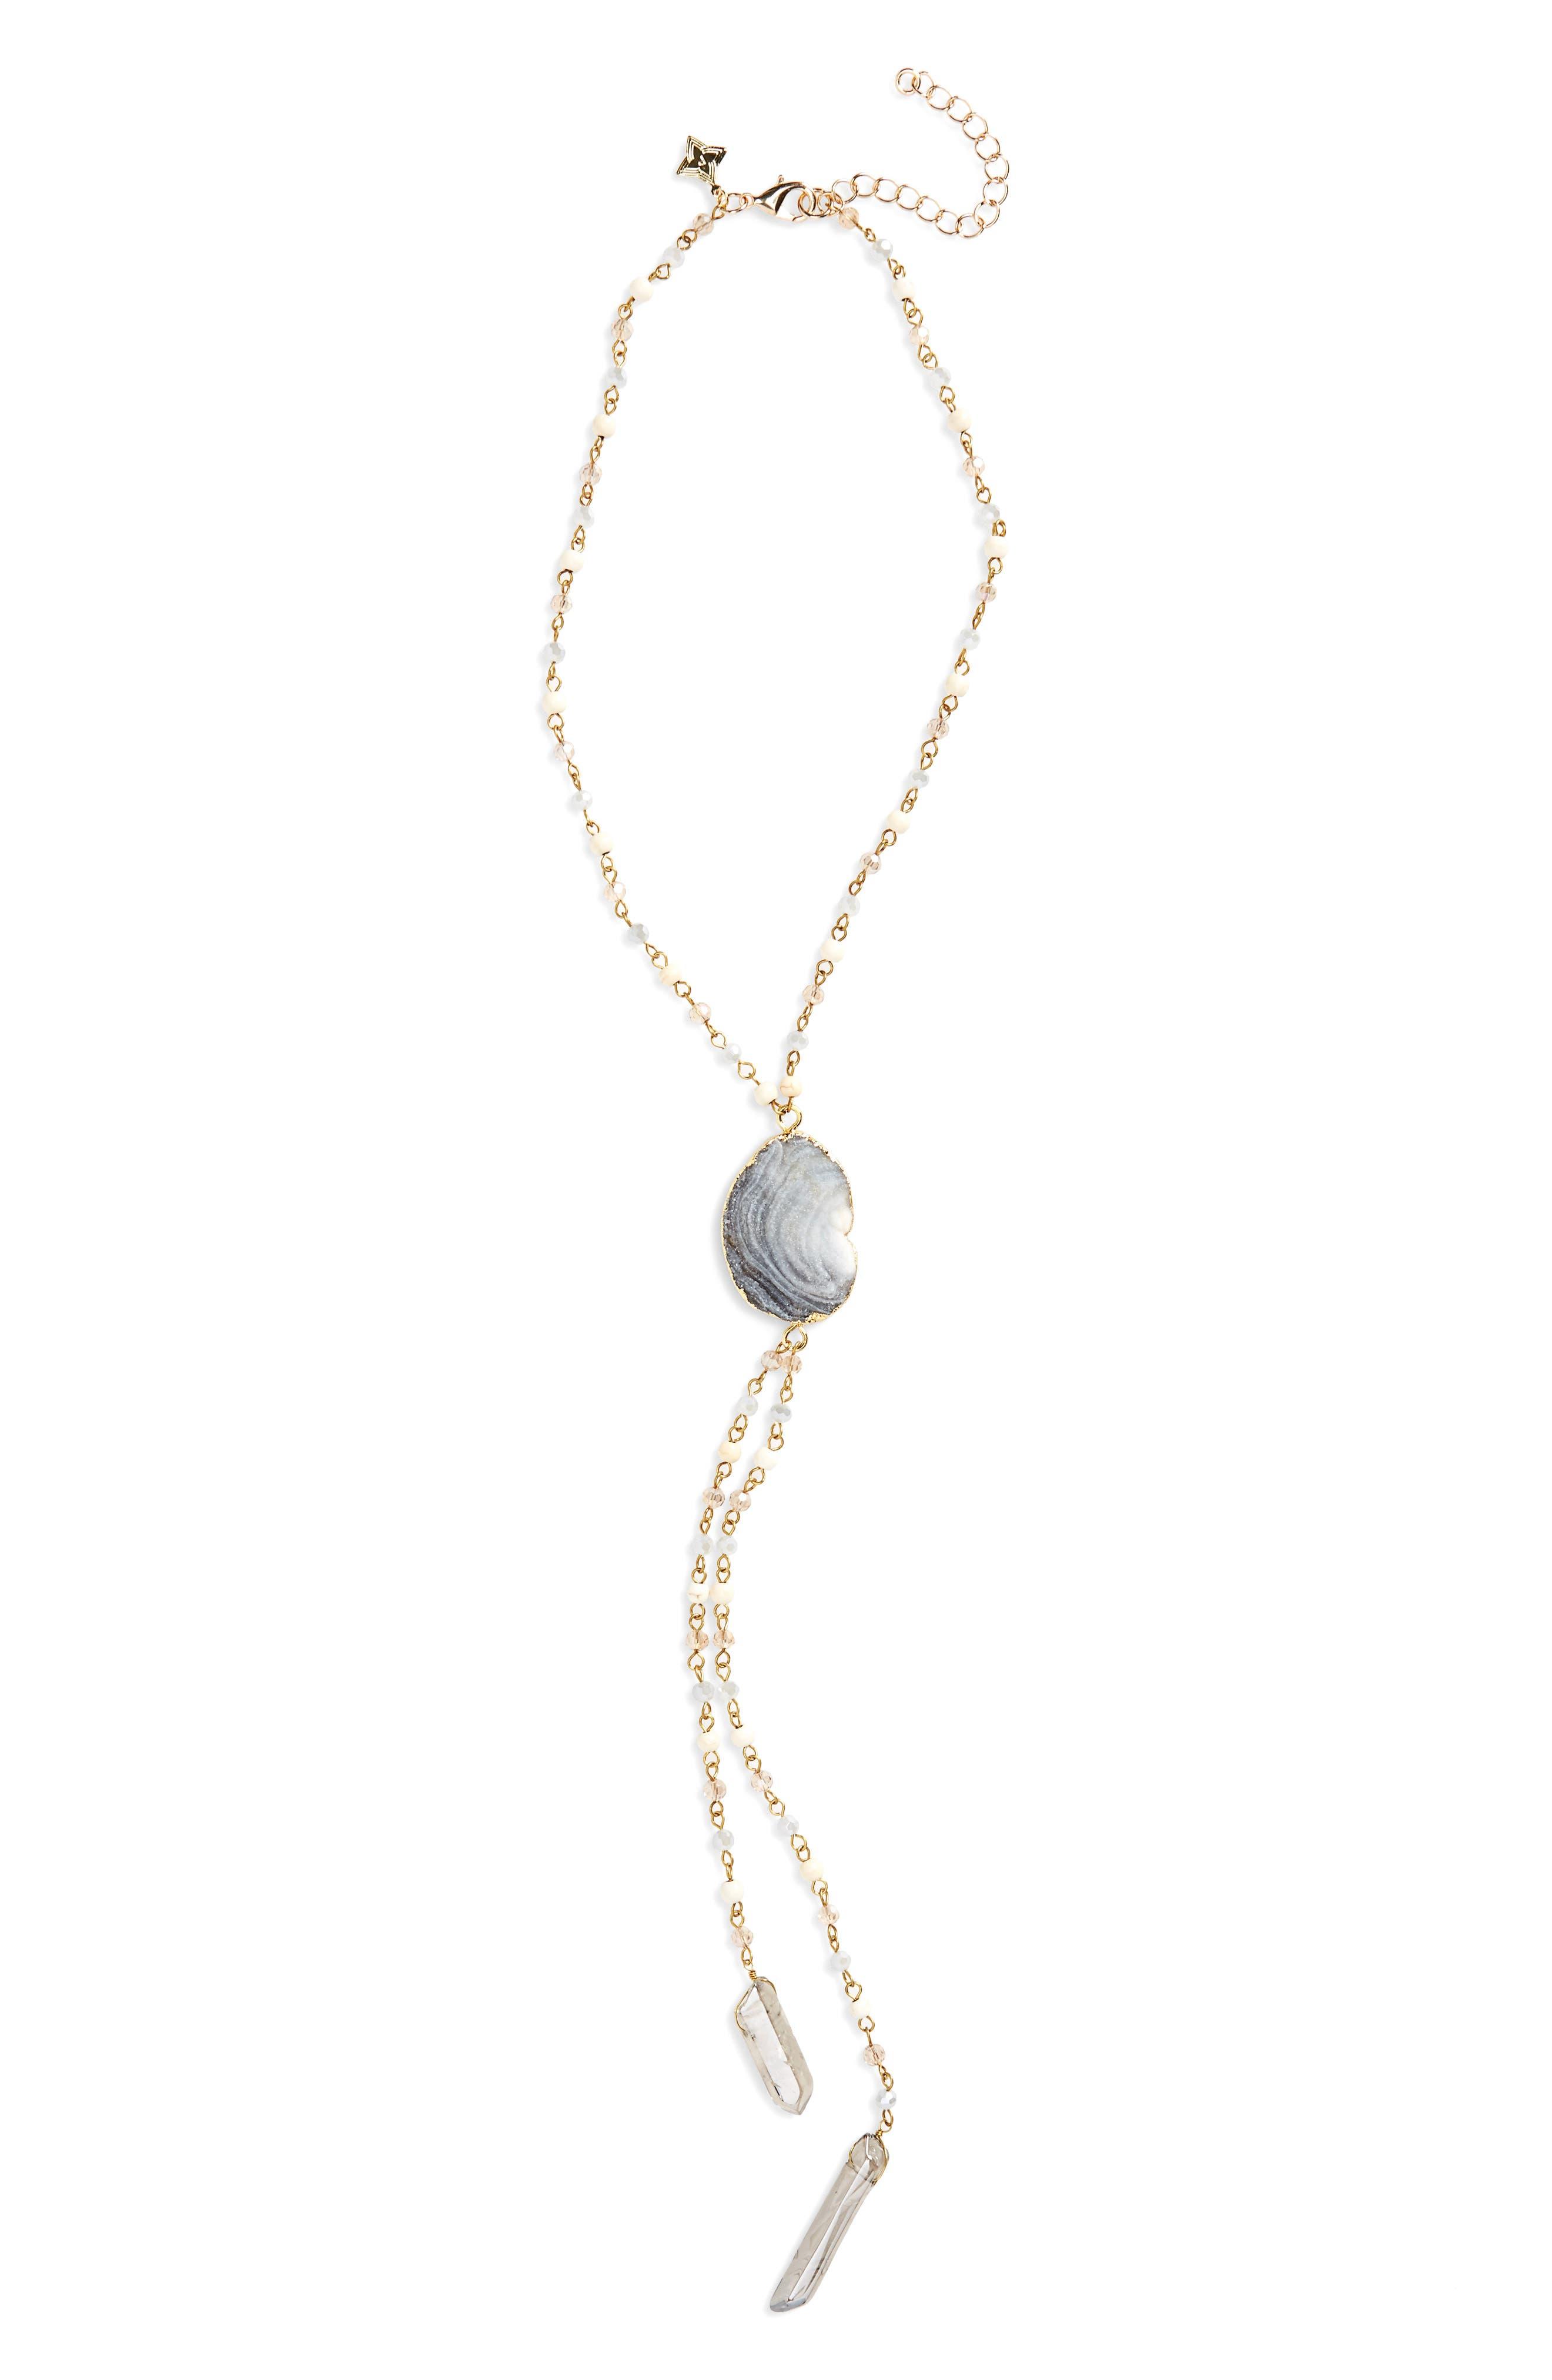 Y Necklace,                             Main thumbnail 1, color,                             020